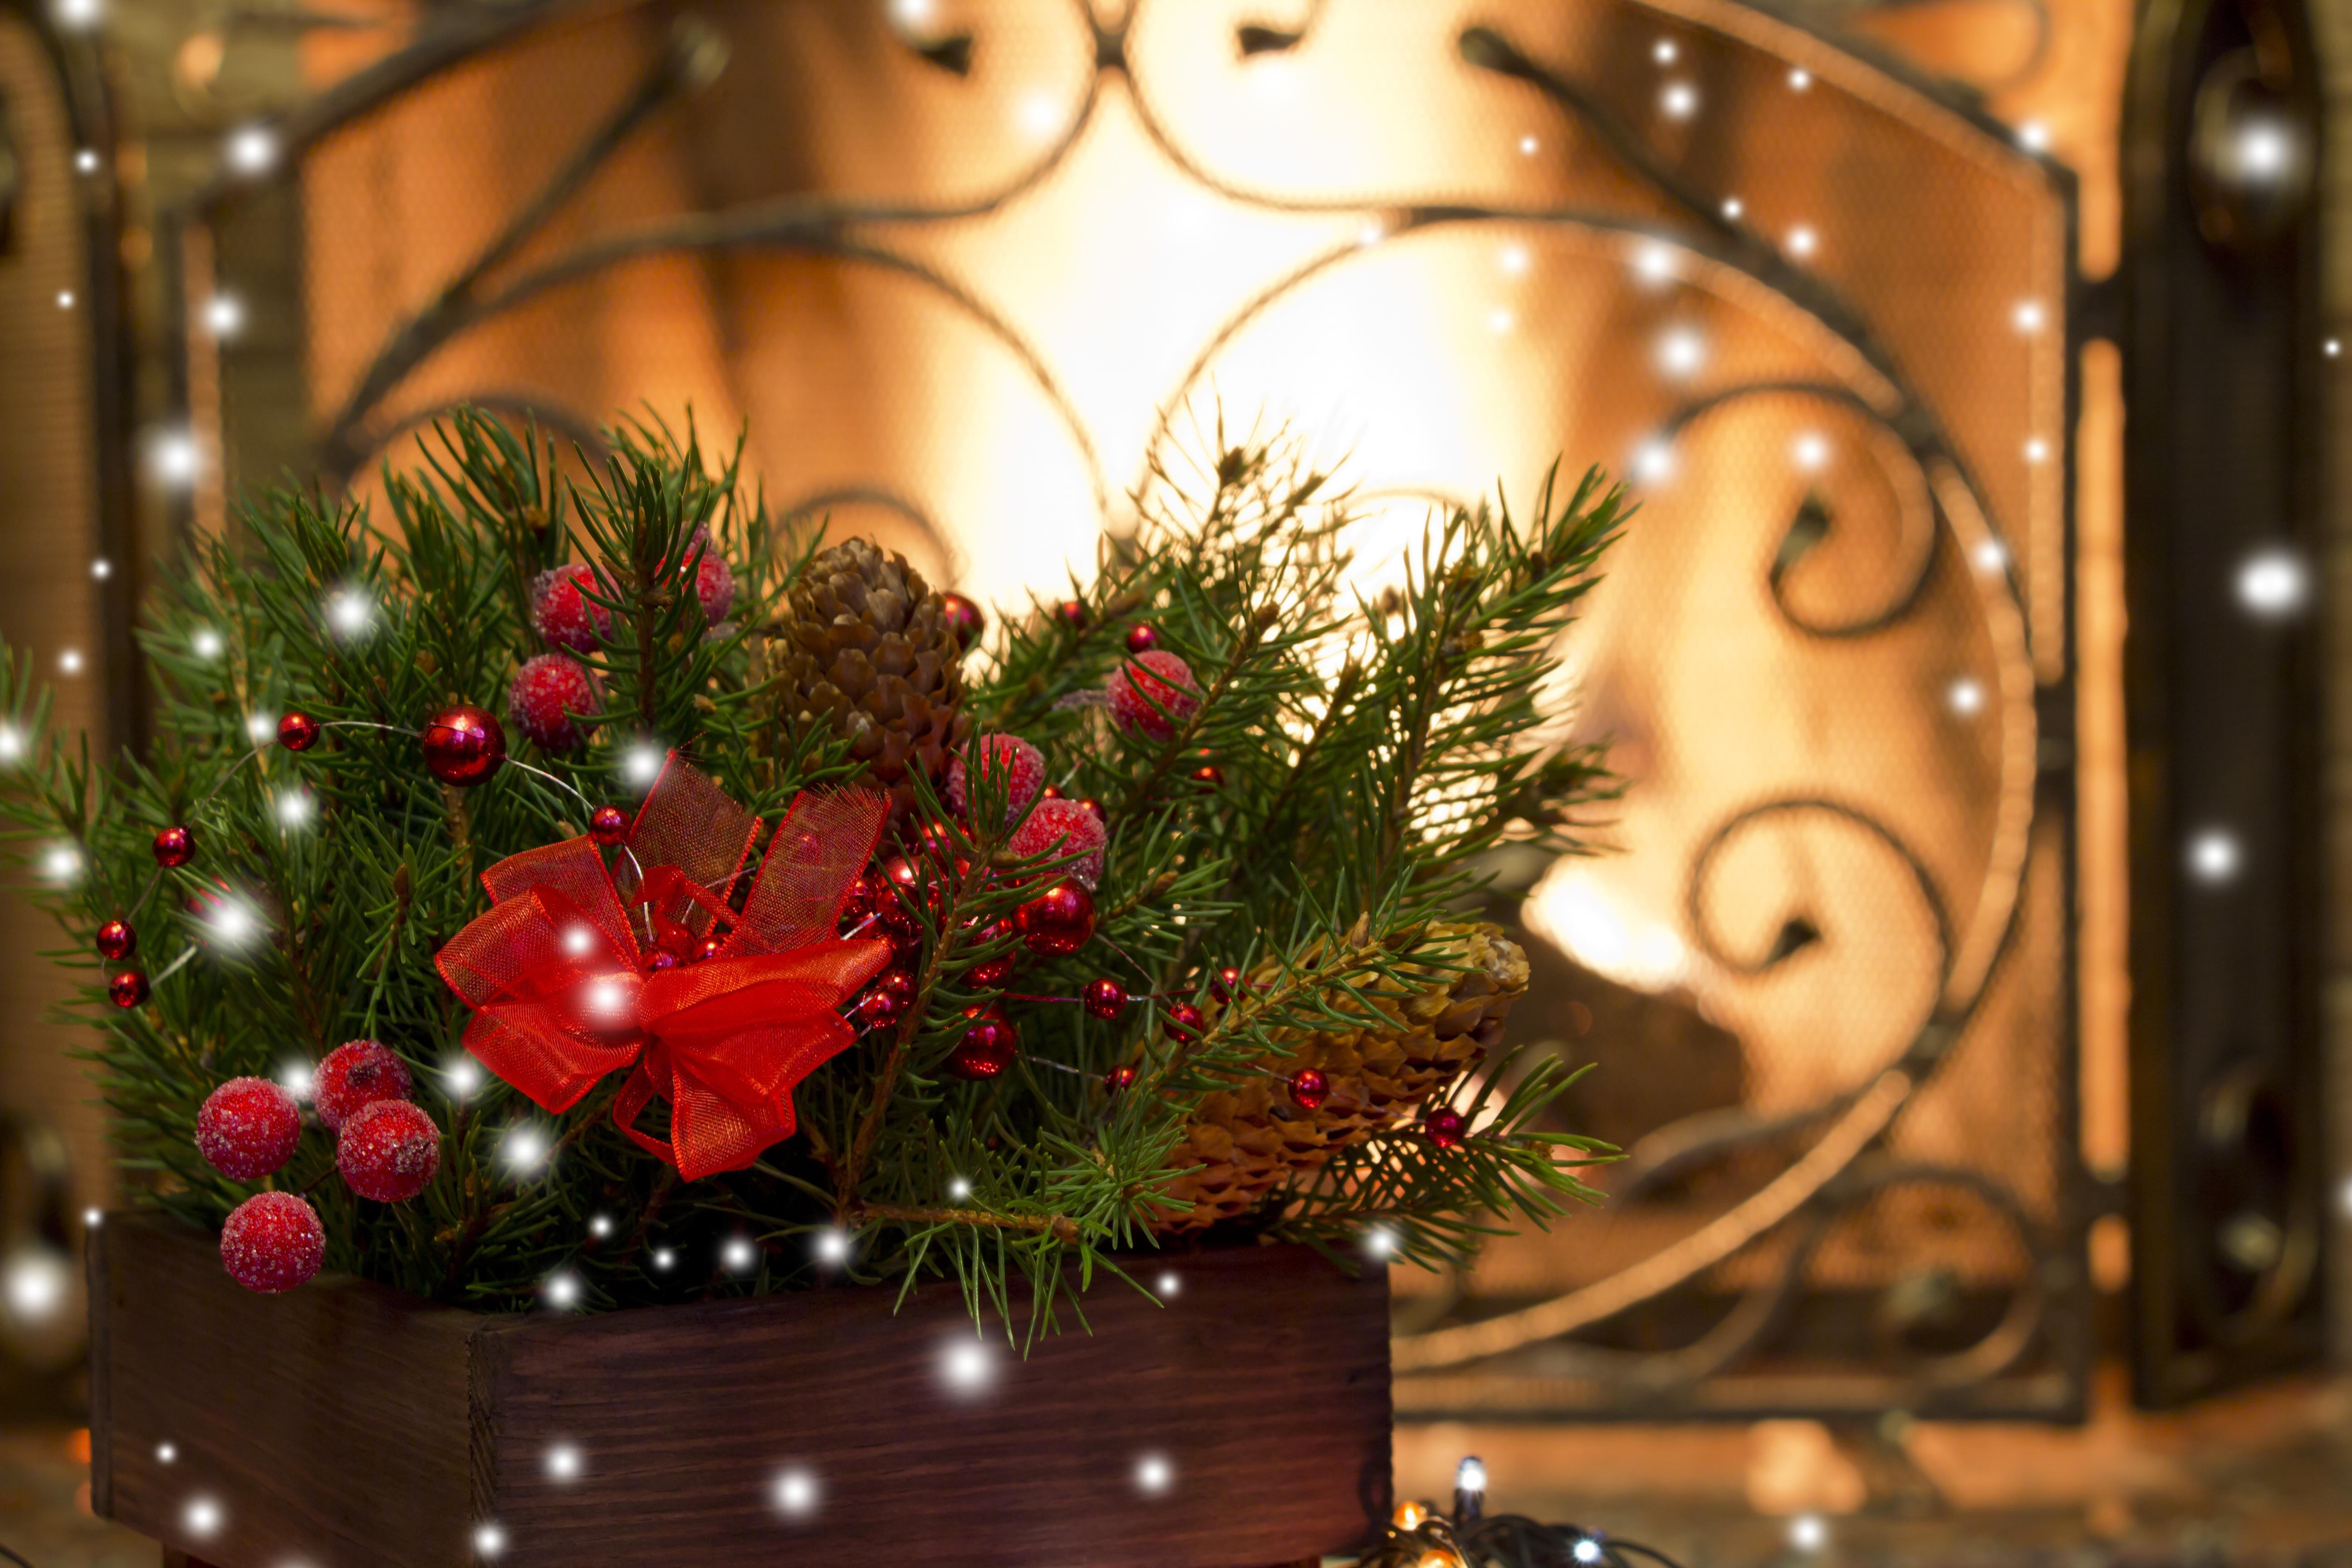 Celebrating Christmas in Norway